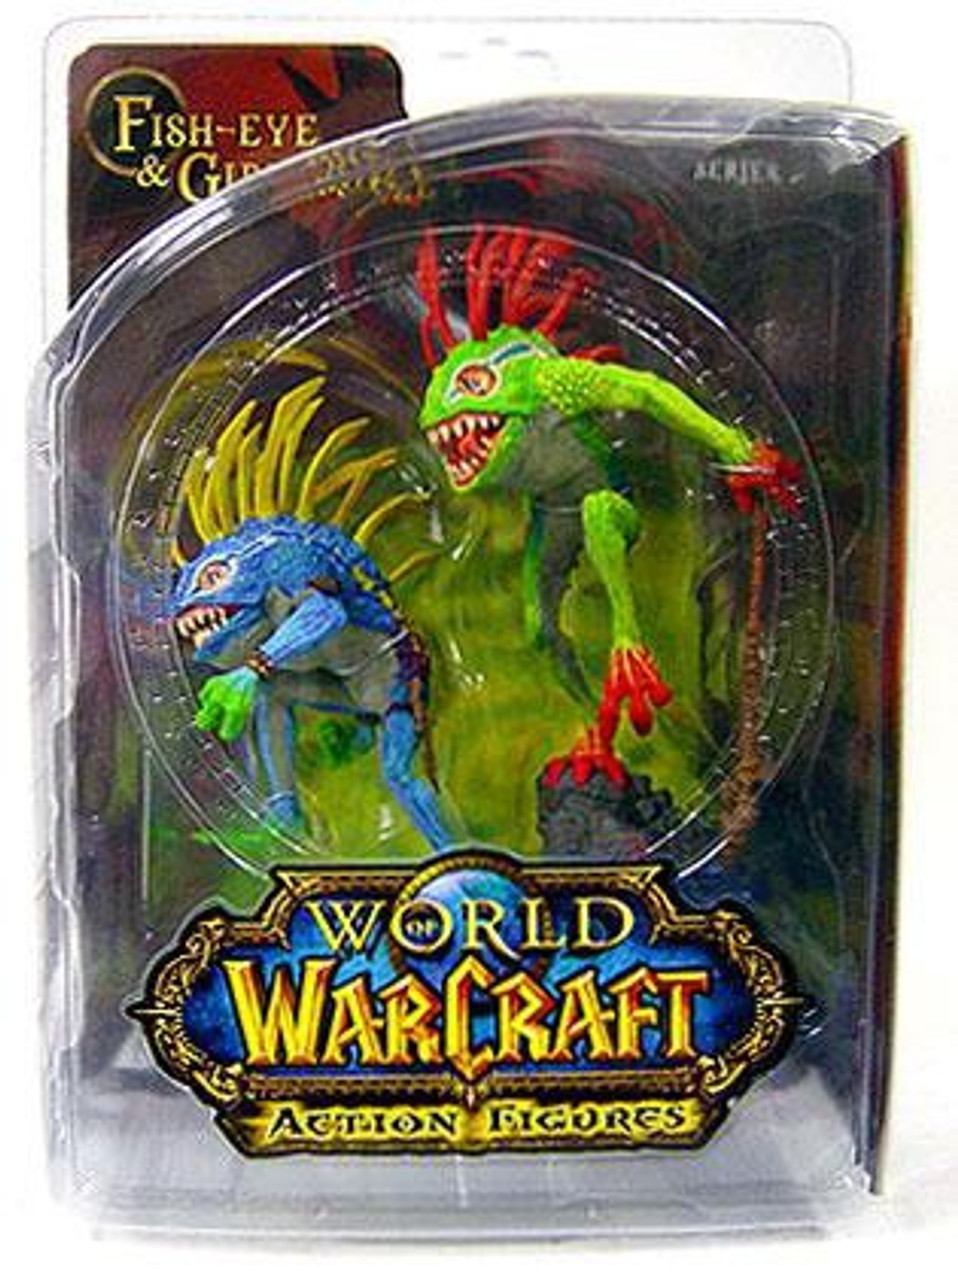 World of Warcraft Series 4 Fish-Eye & Gibbergil Murloc Action Figure 2-Pack [Green on Top]